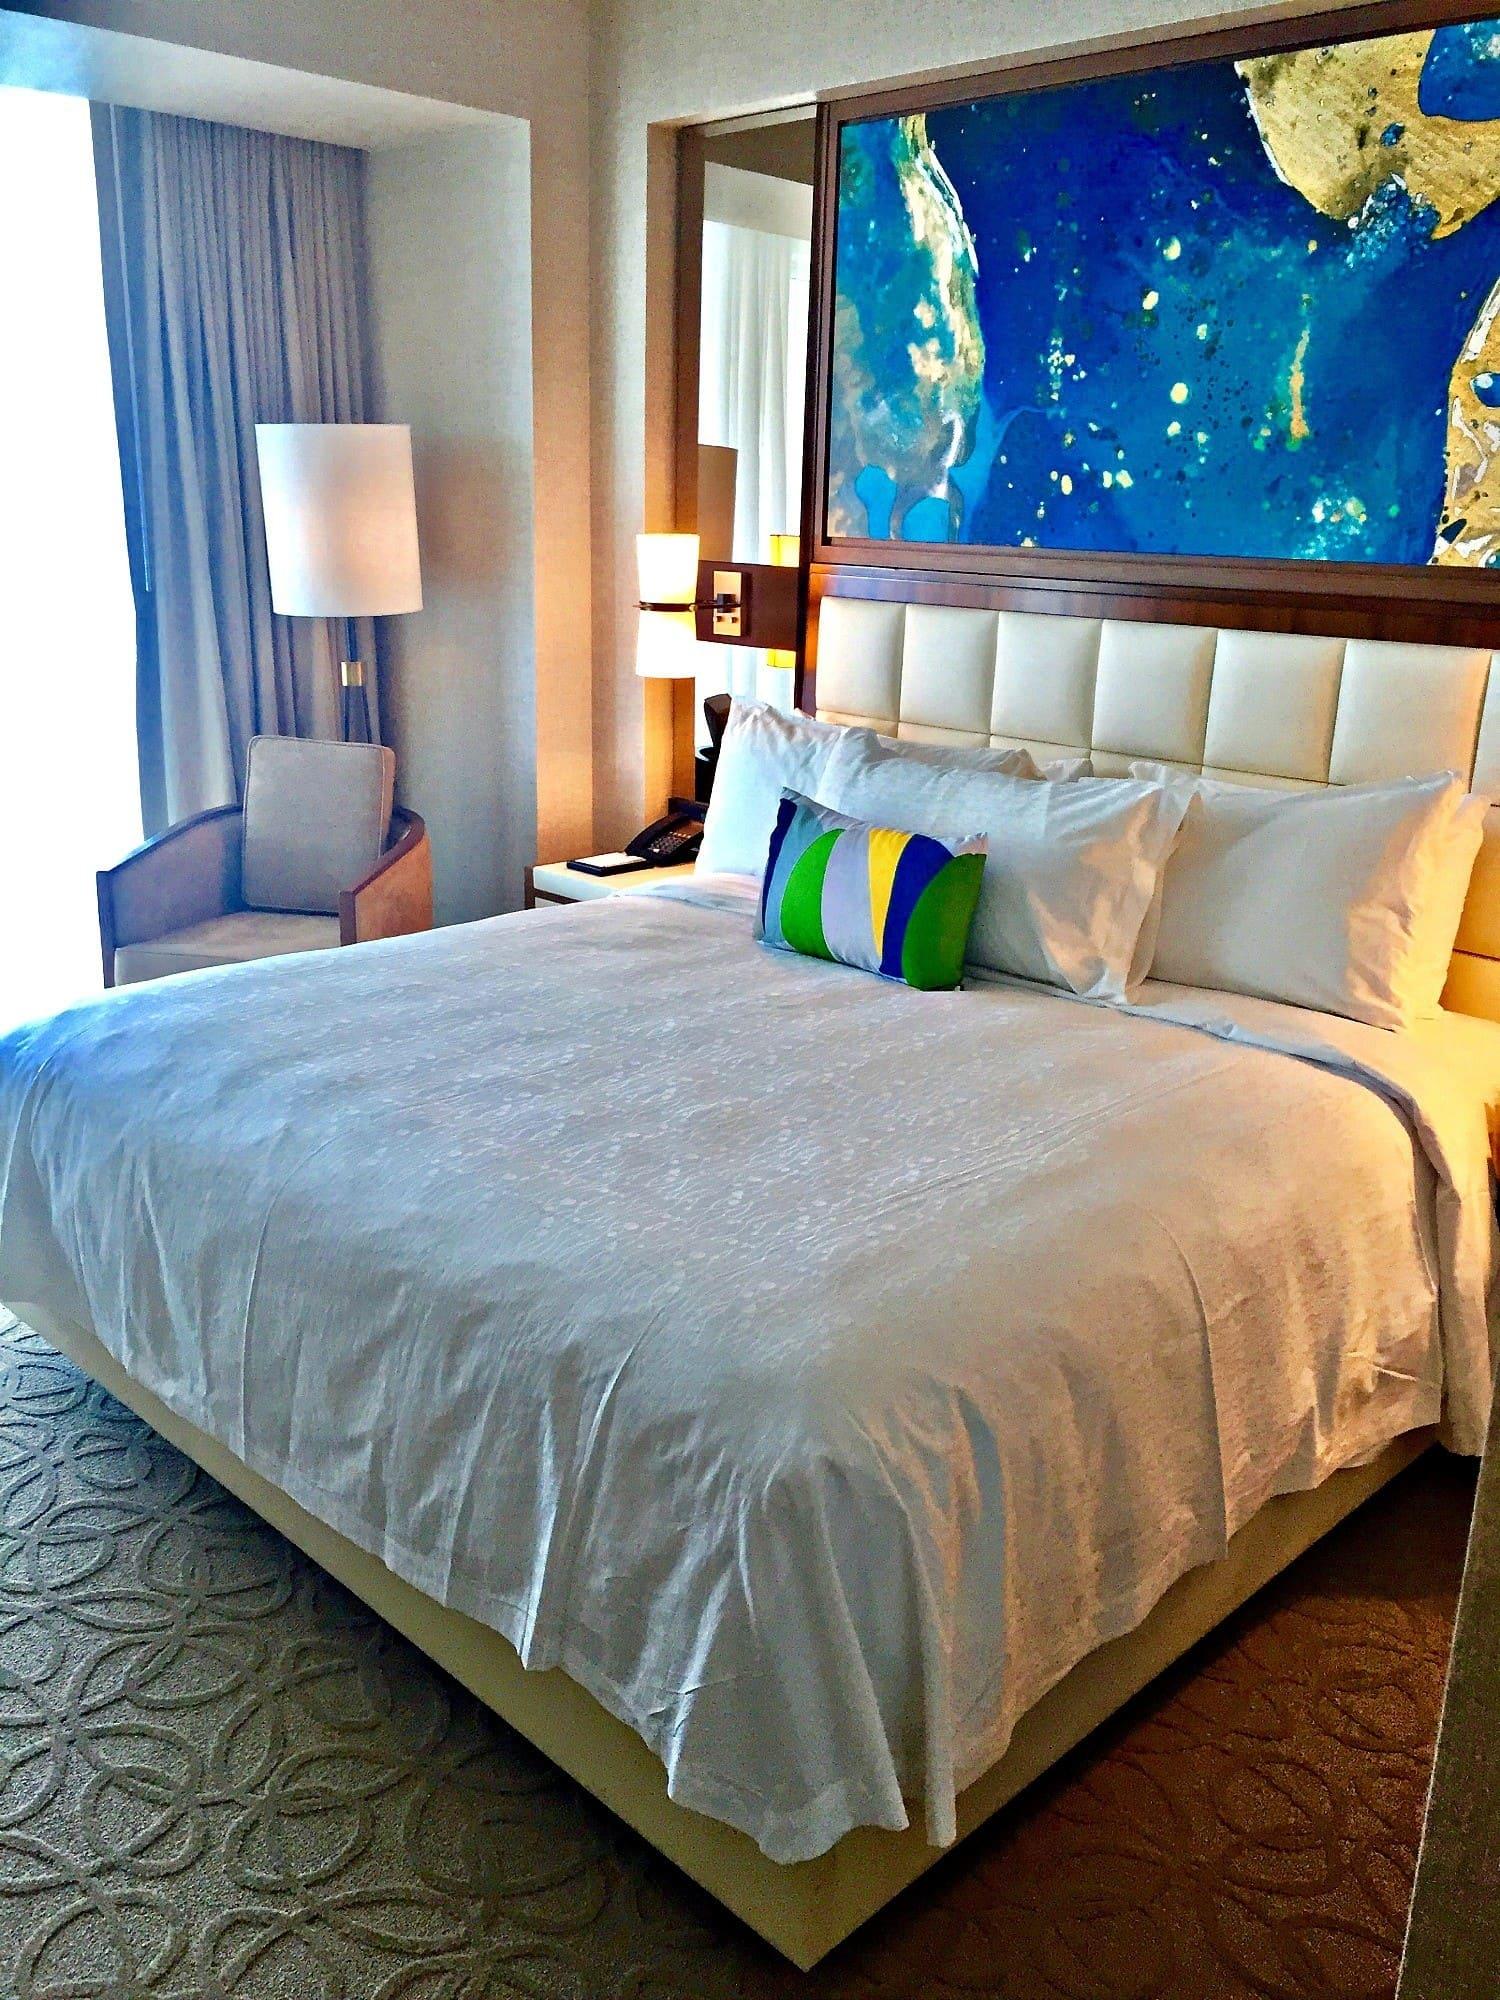 Conrad Fort Lauderdale one bedroom suite